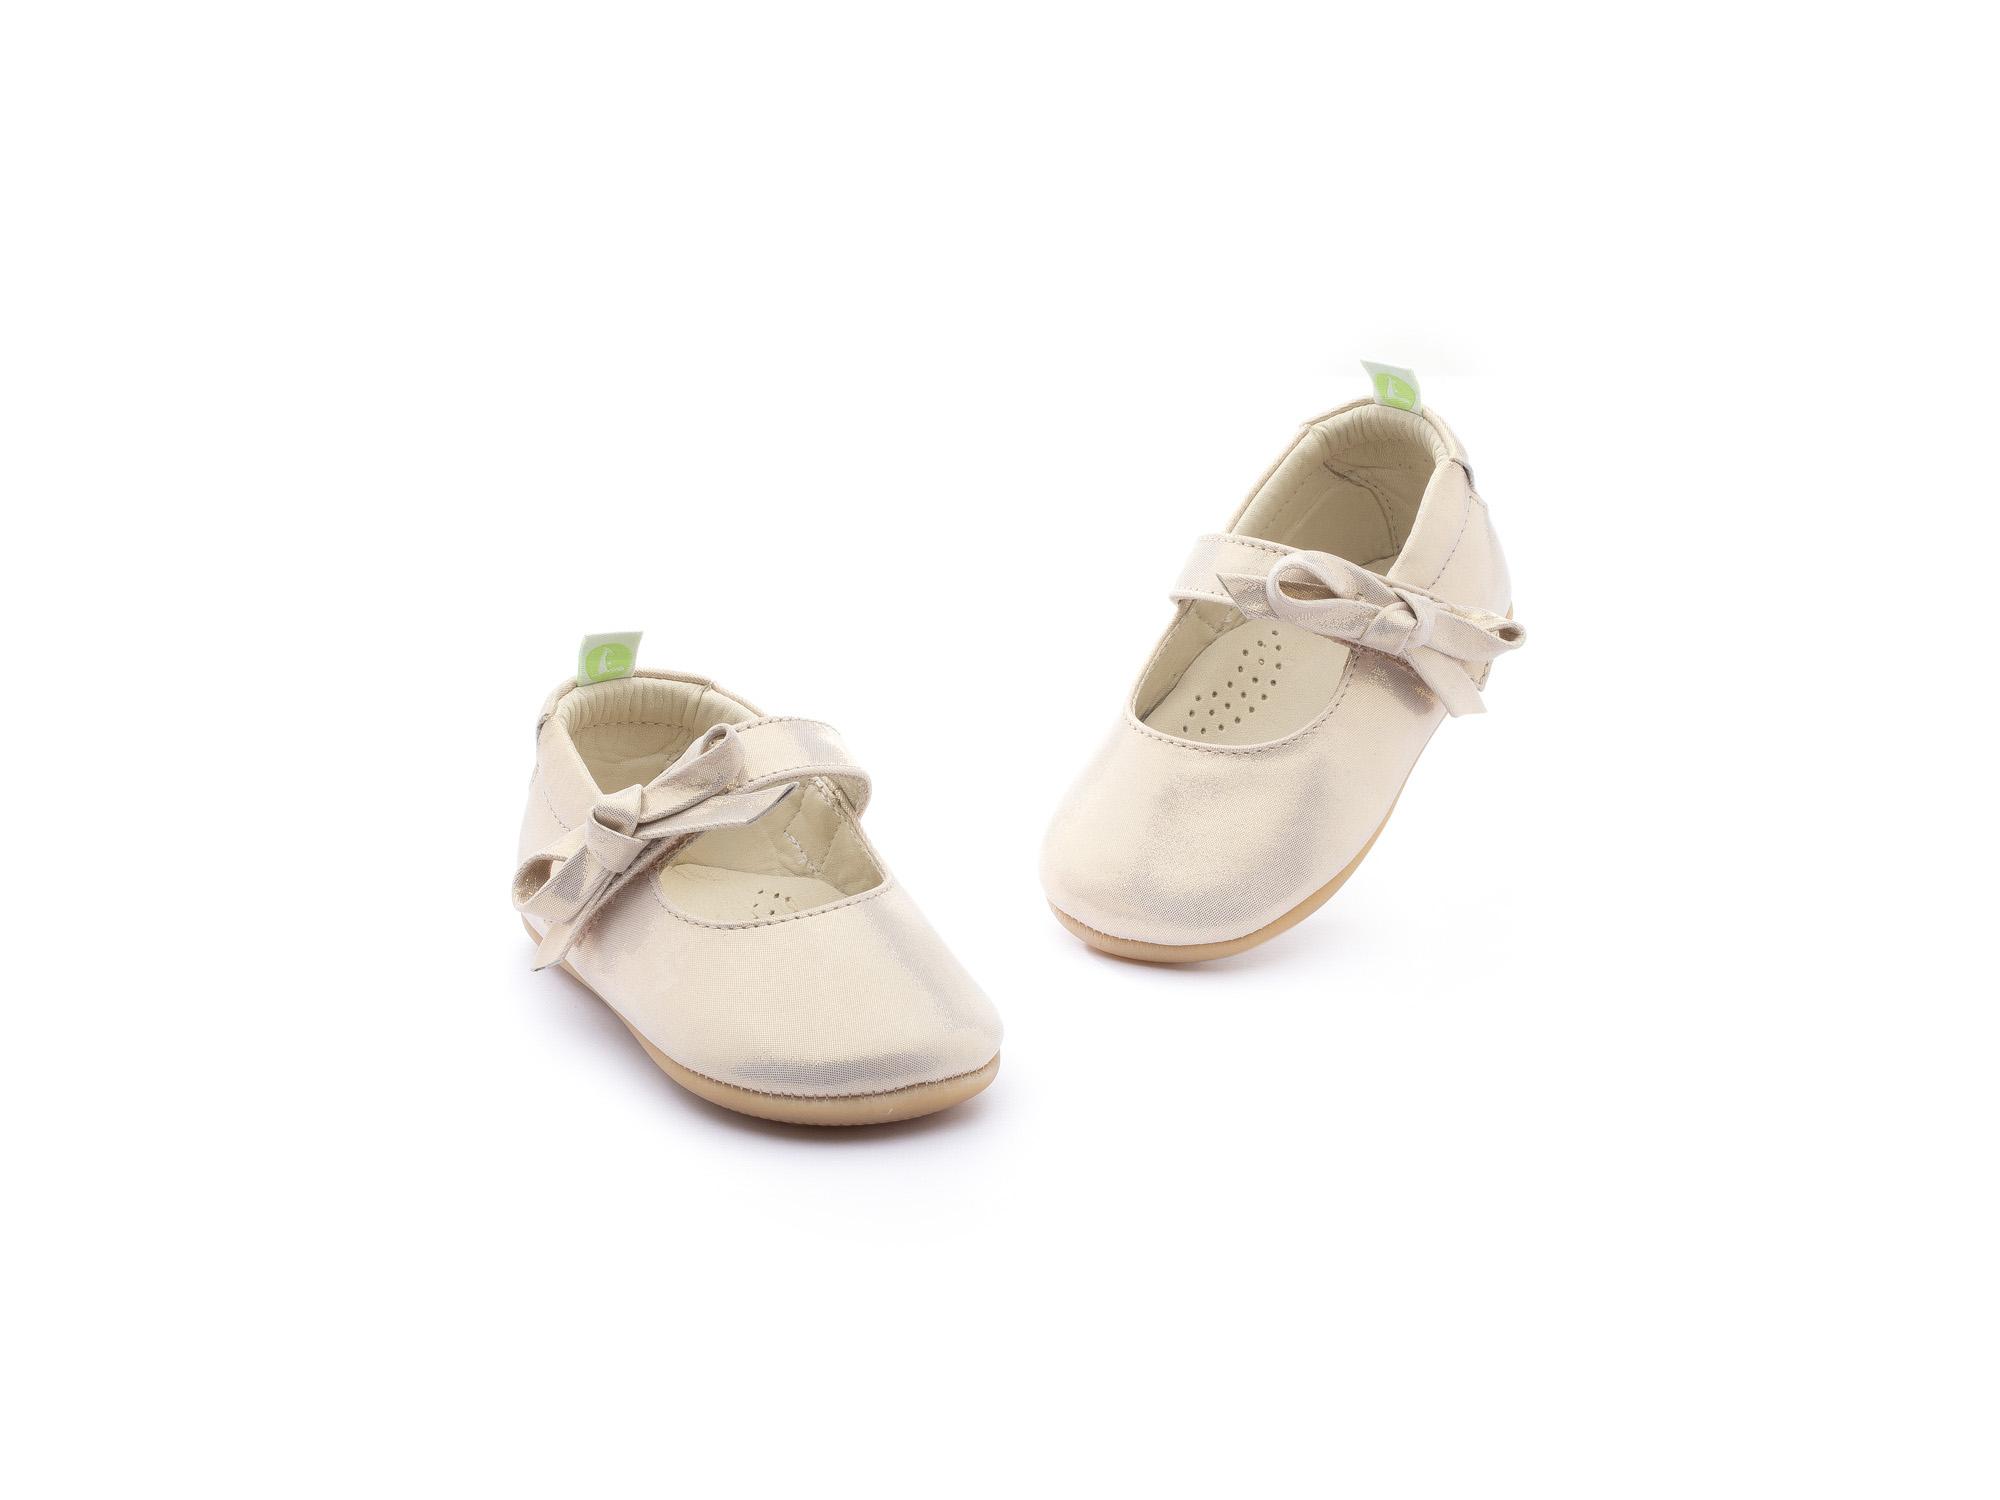 Boneca Dorothy Cotton Candy Foil Baby 0 à 2 anos - 3